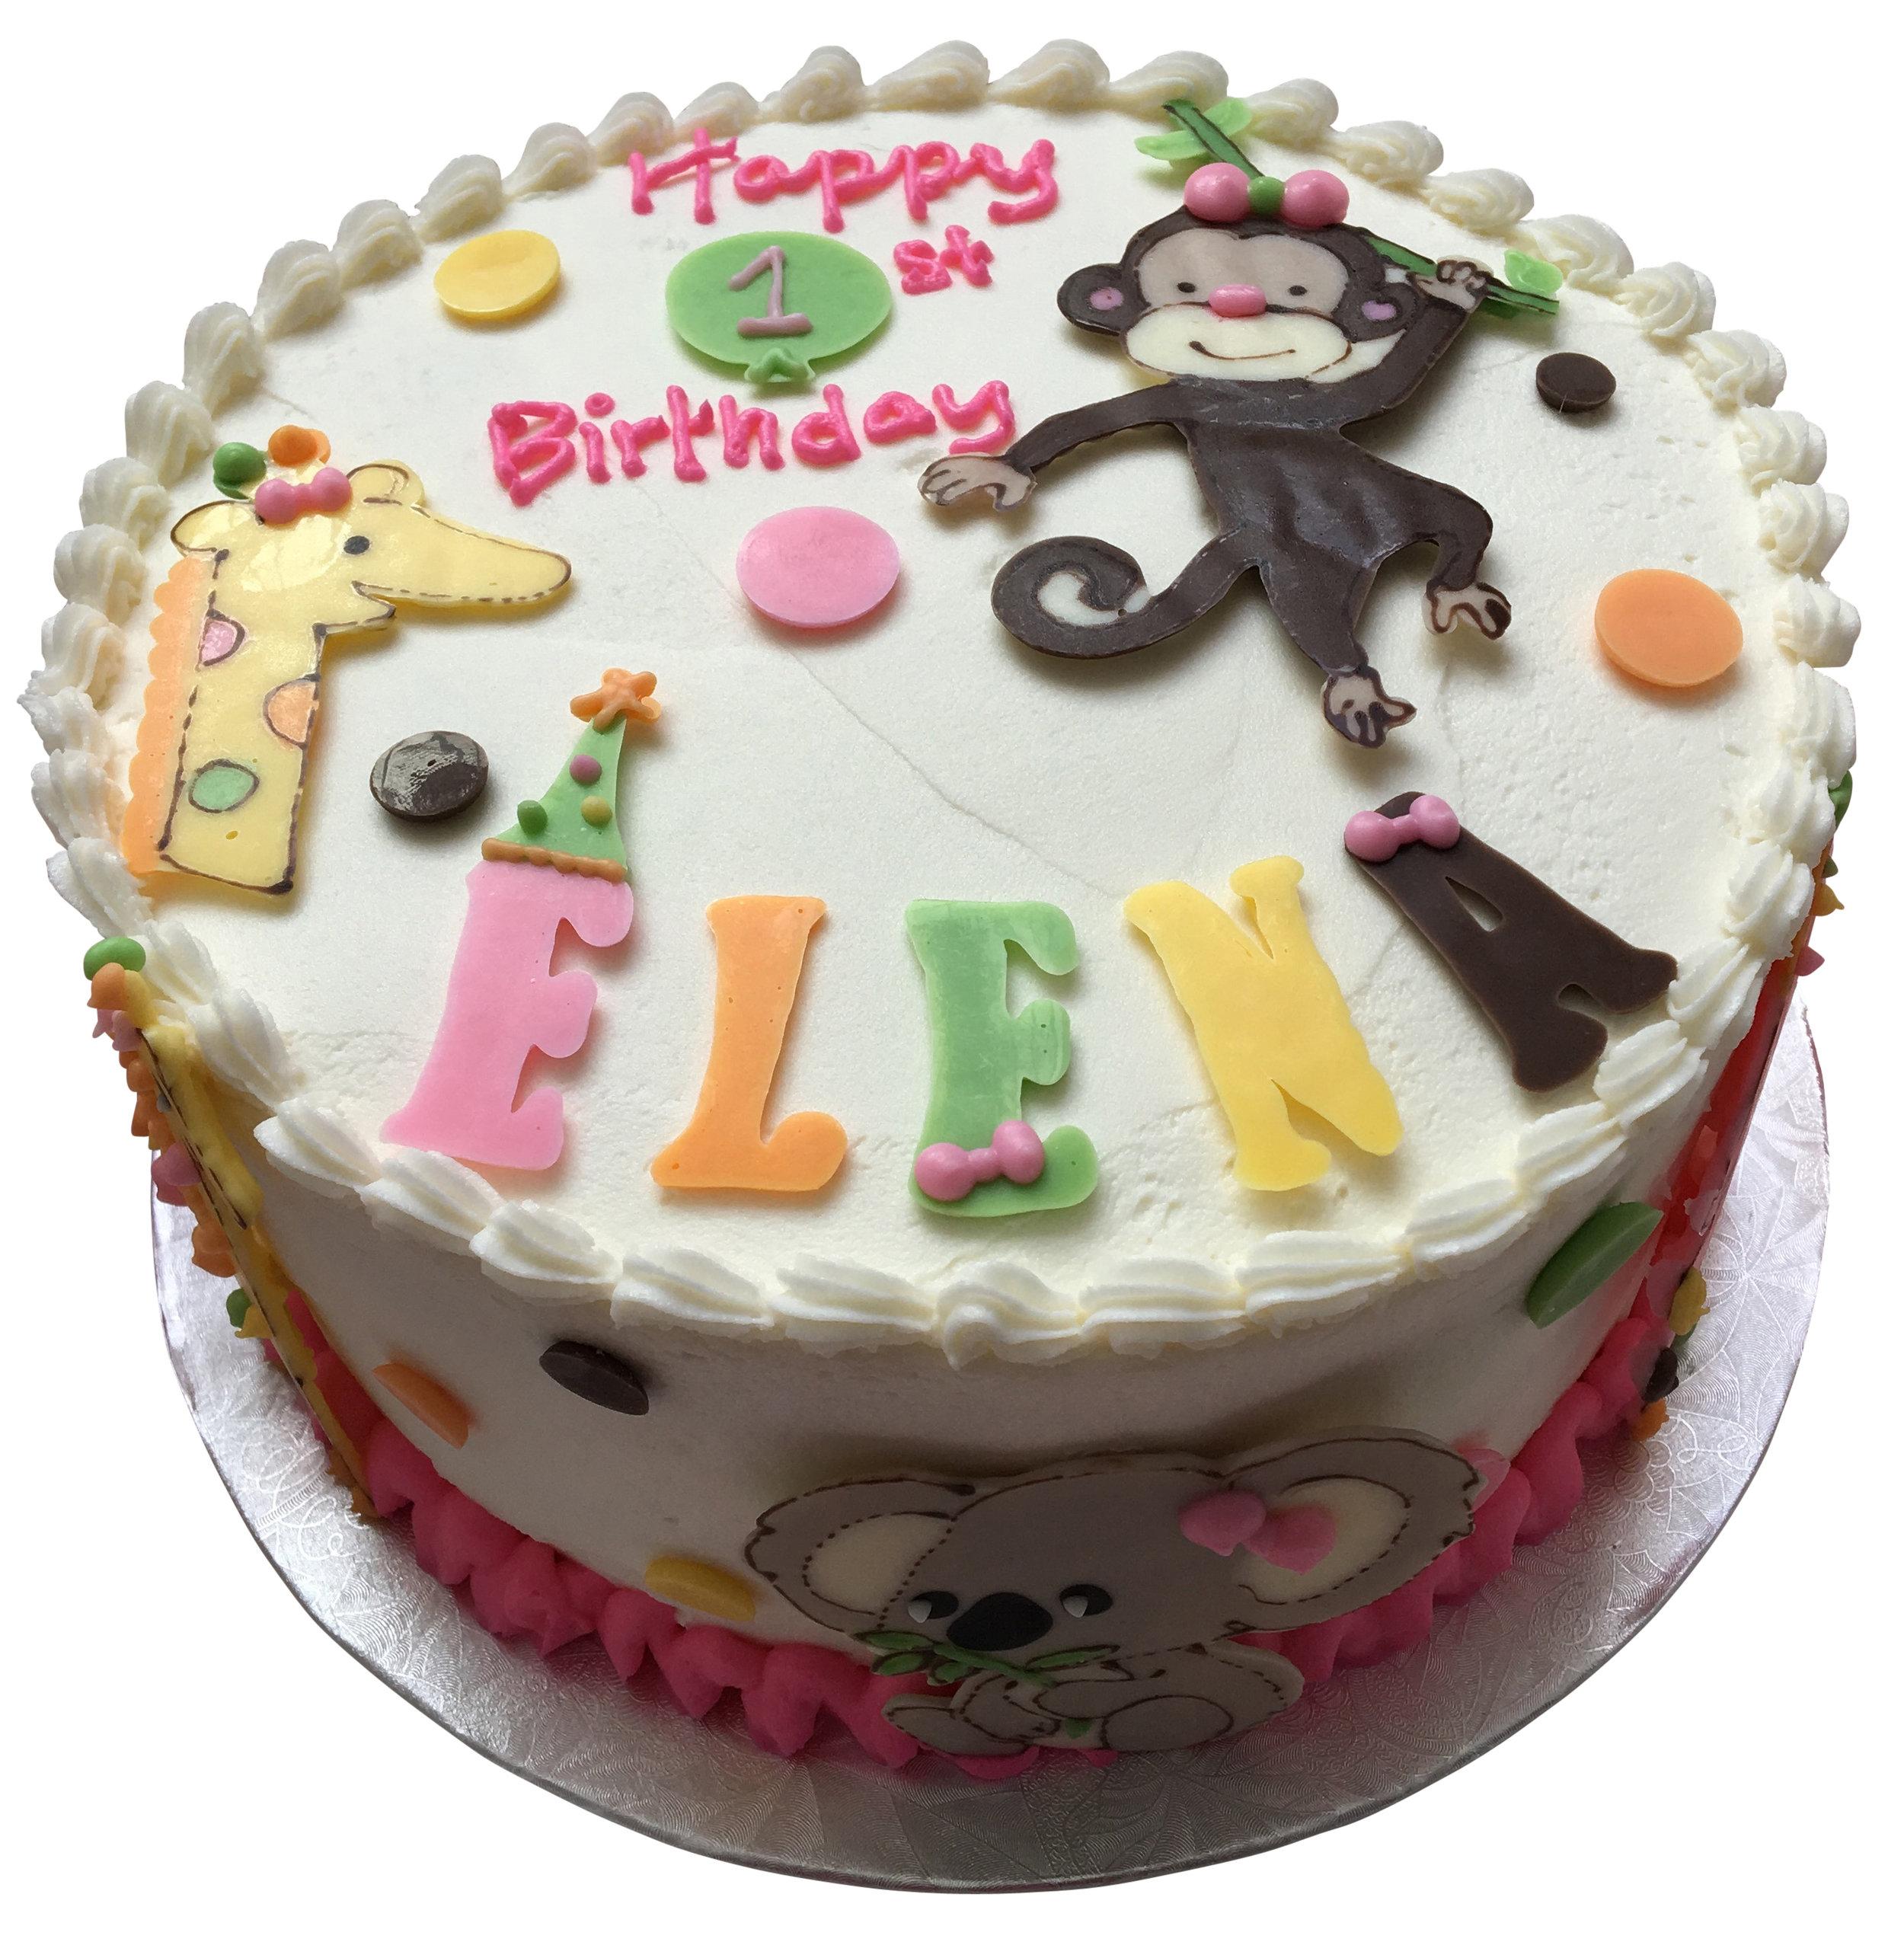 BeBe-Cakes-Giraffe-Monkey-Cake.jpg